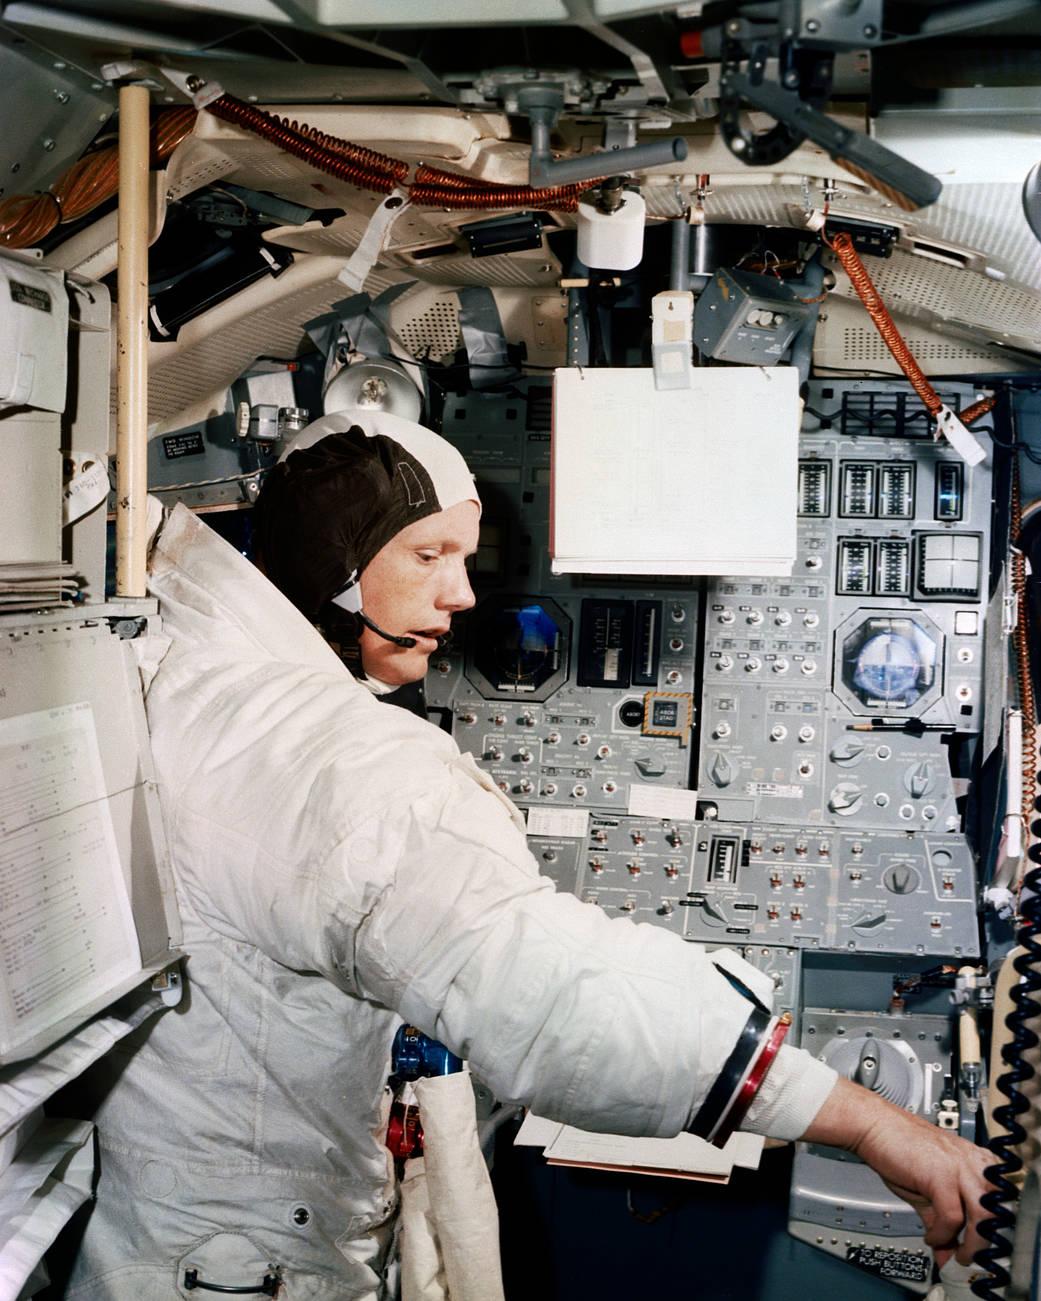 Neil Armstrong inside the Apollo 11 spaceship